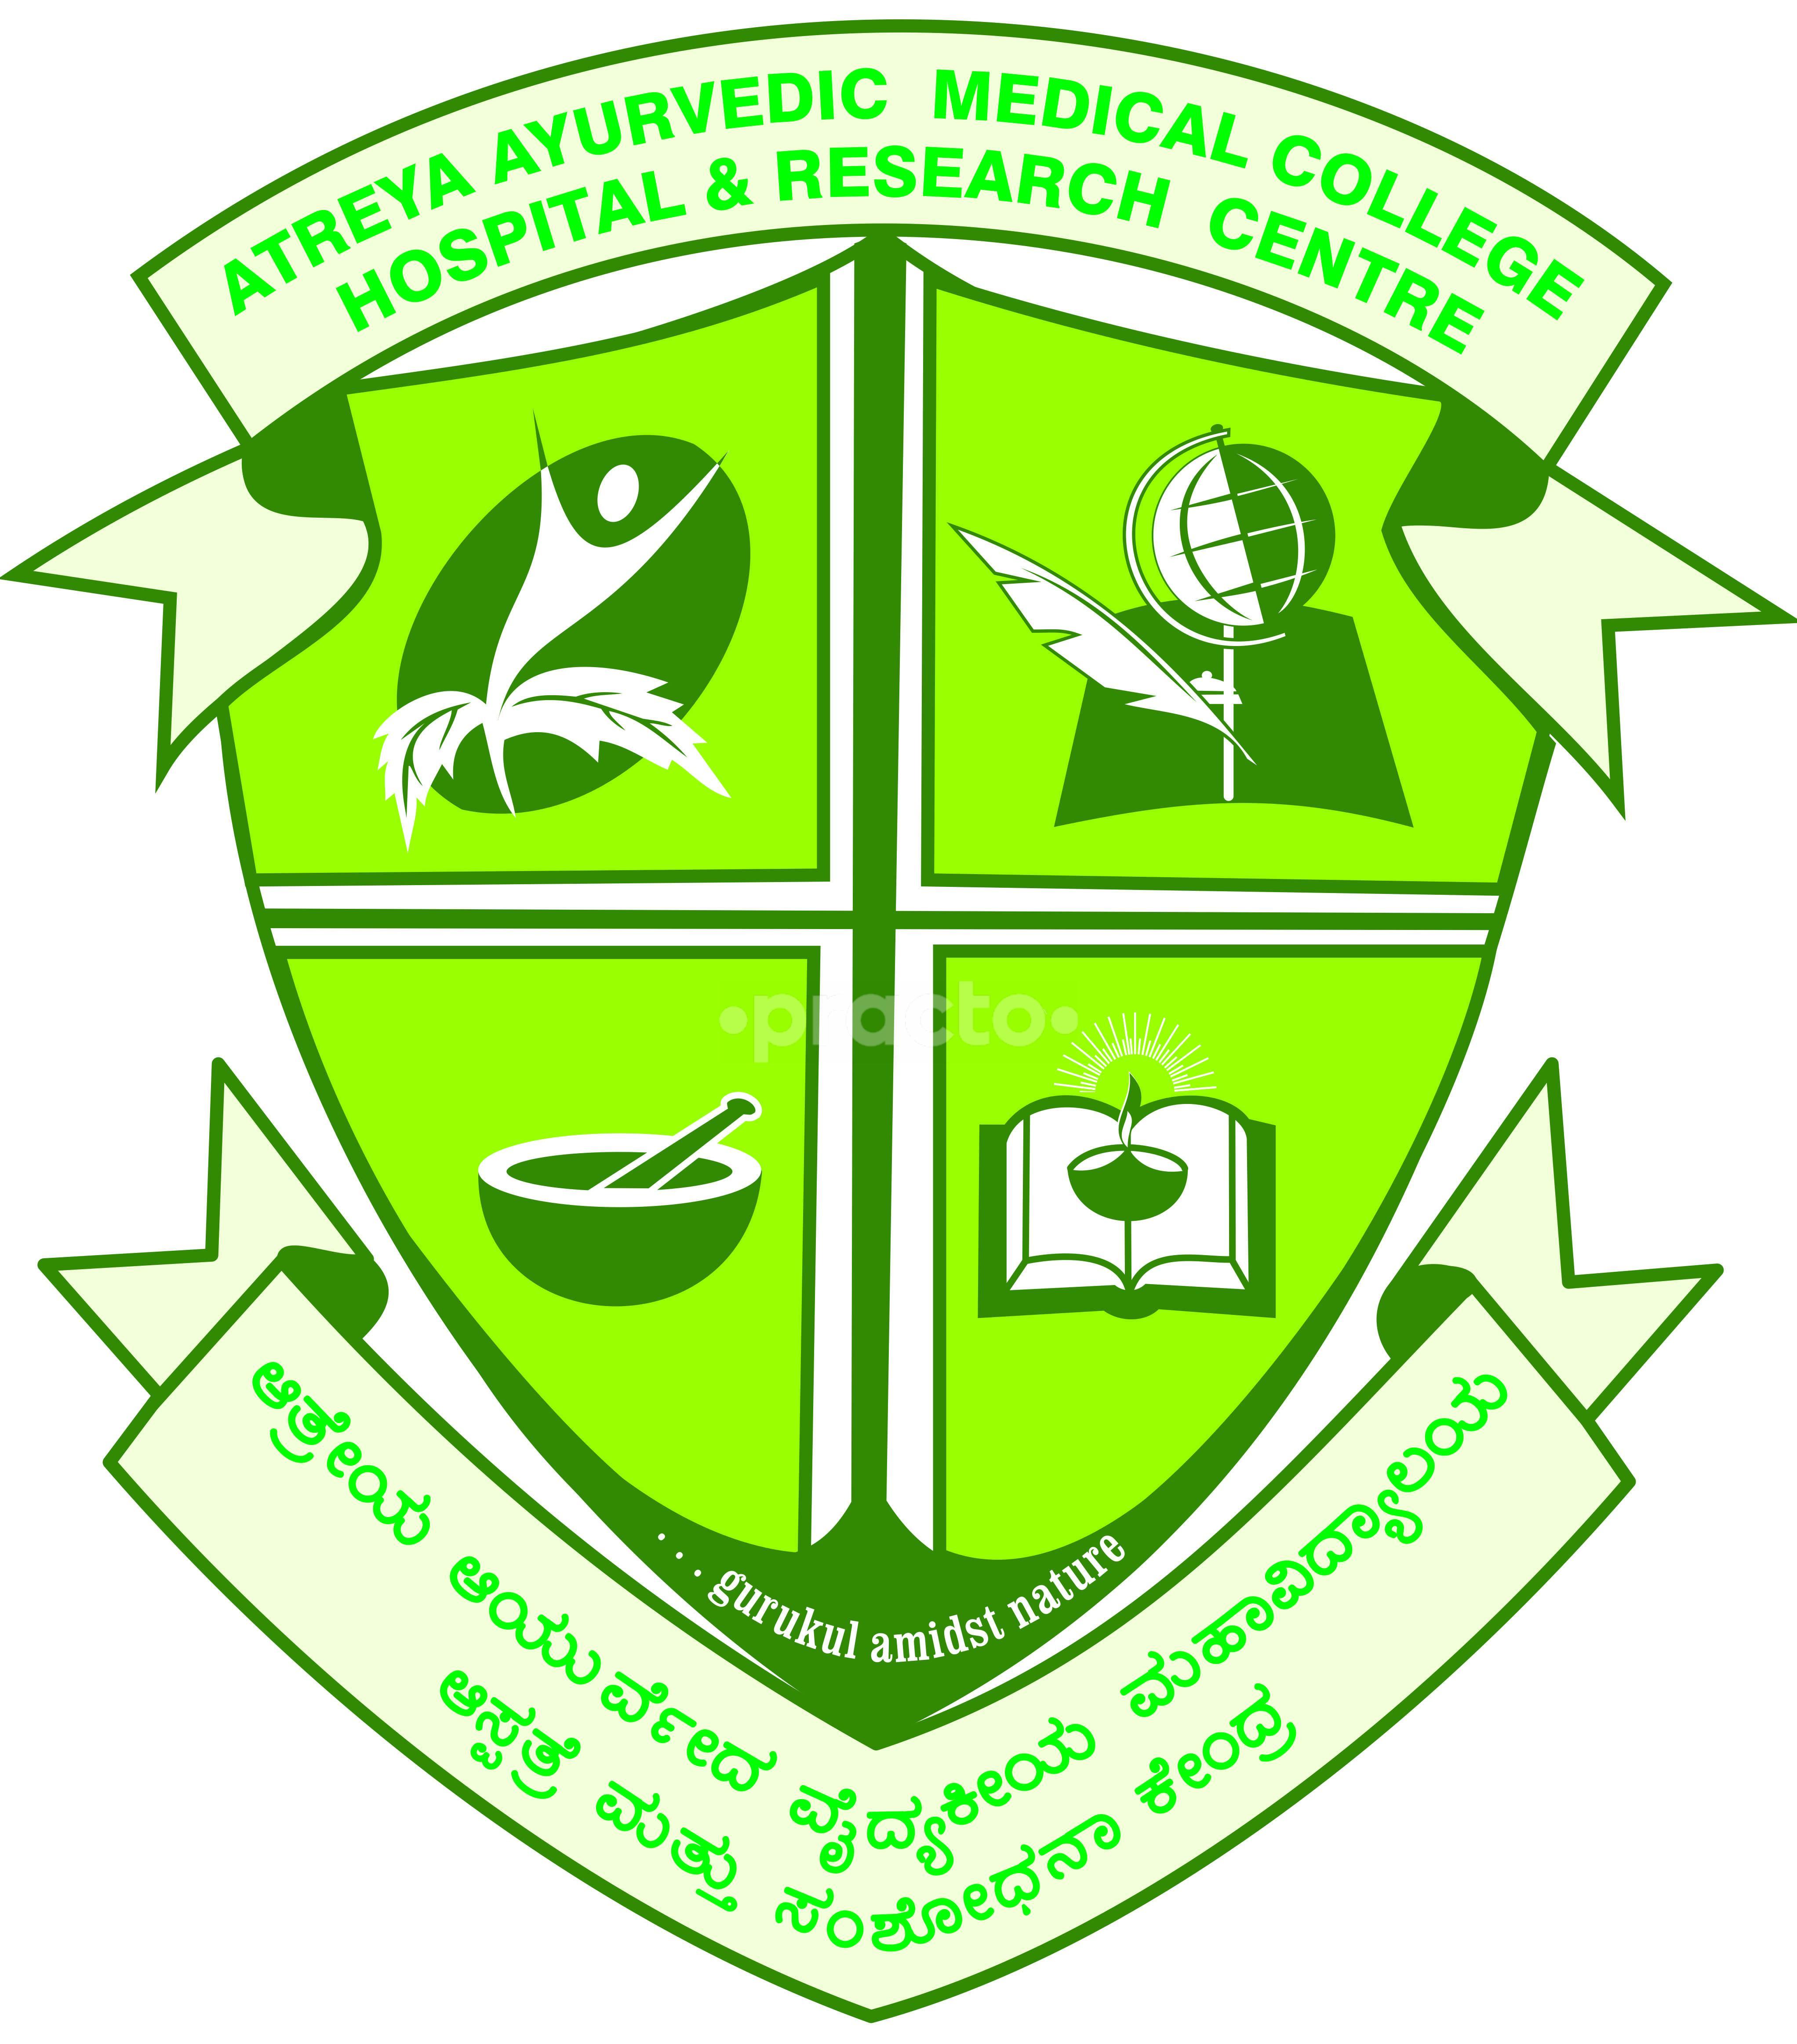 Atreya Ayurvedic Medical College Hospital and Research Centre